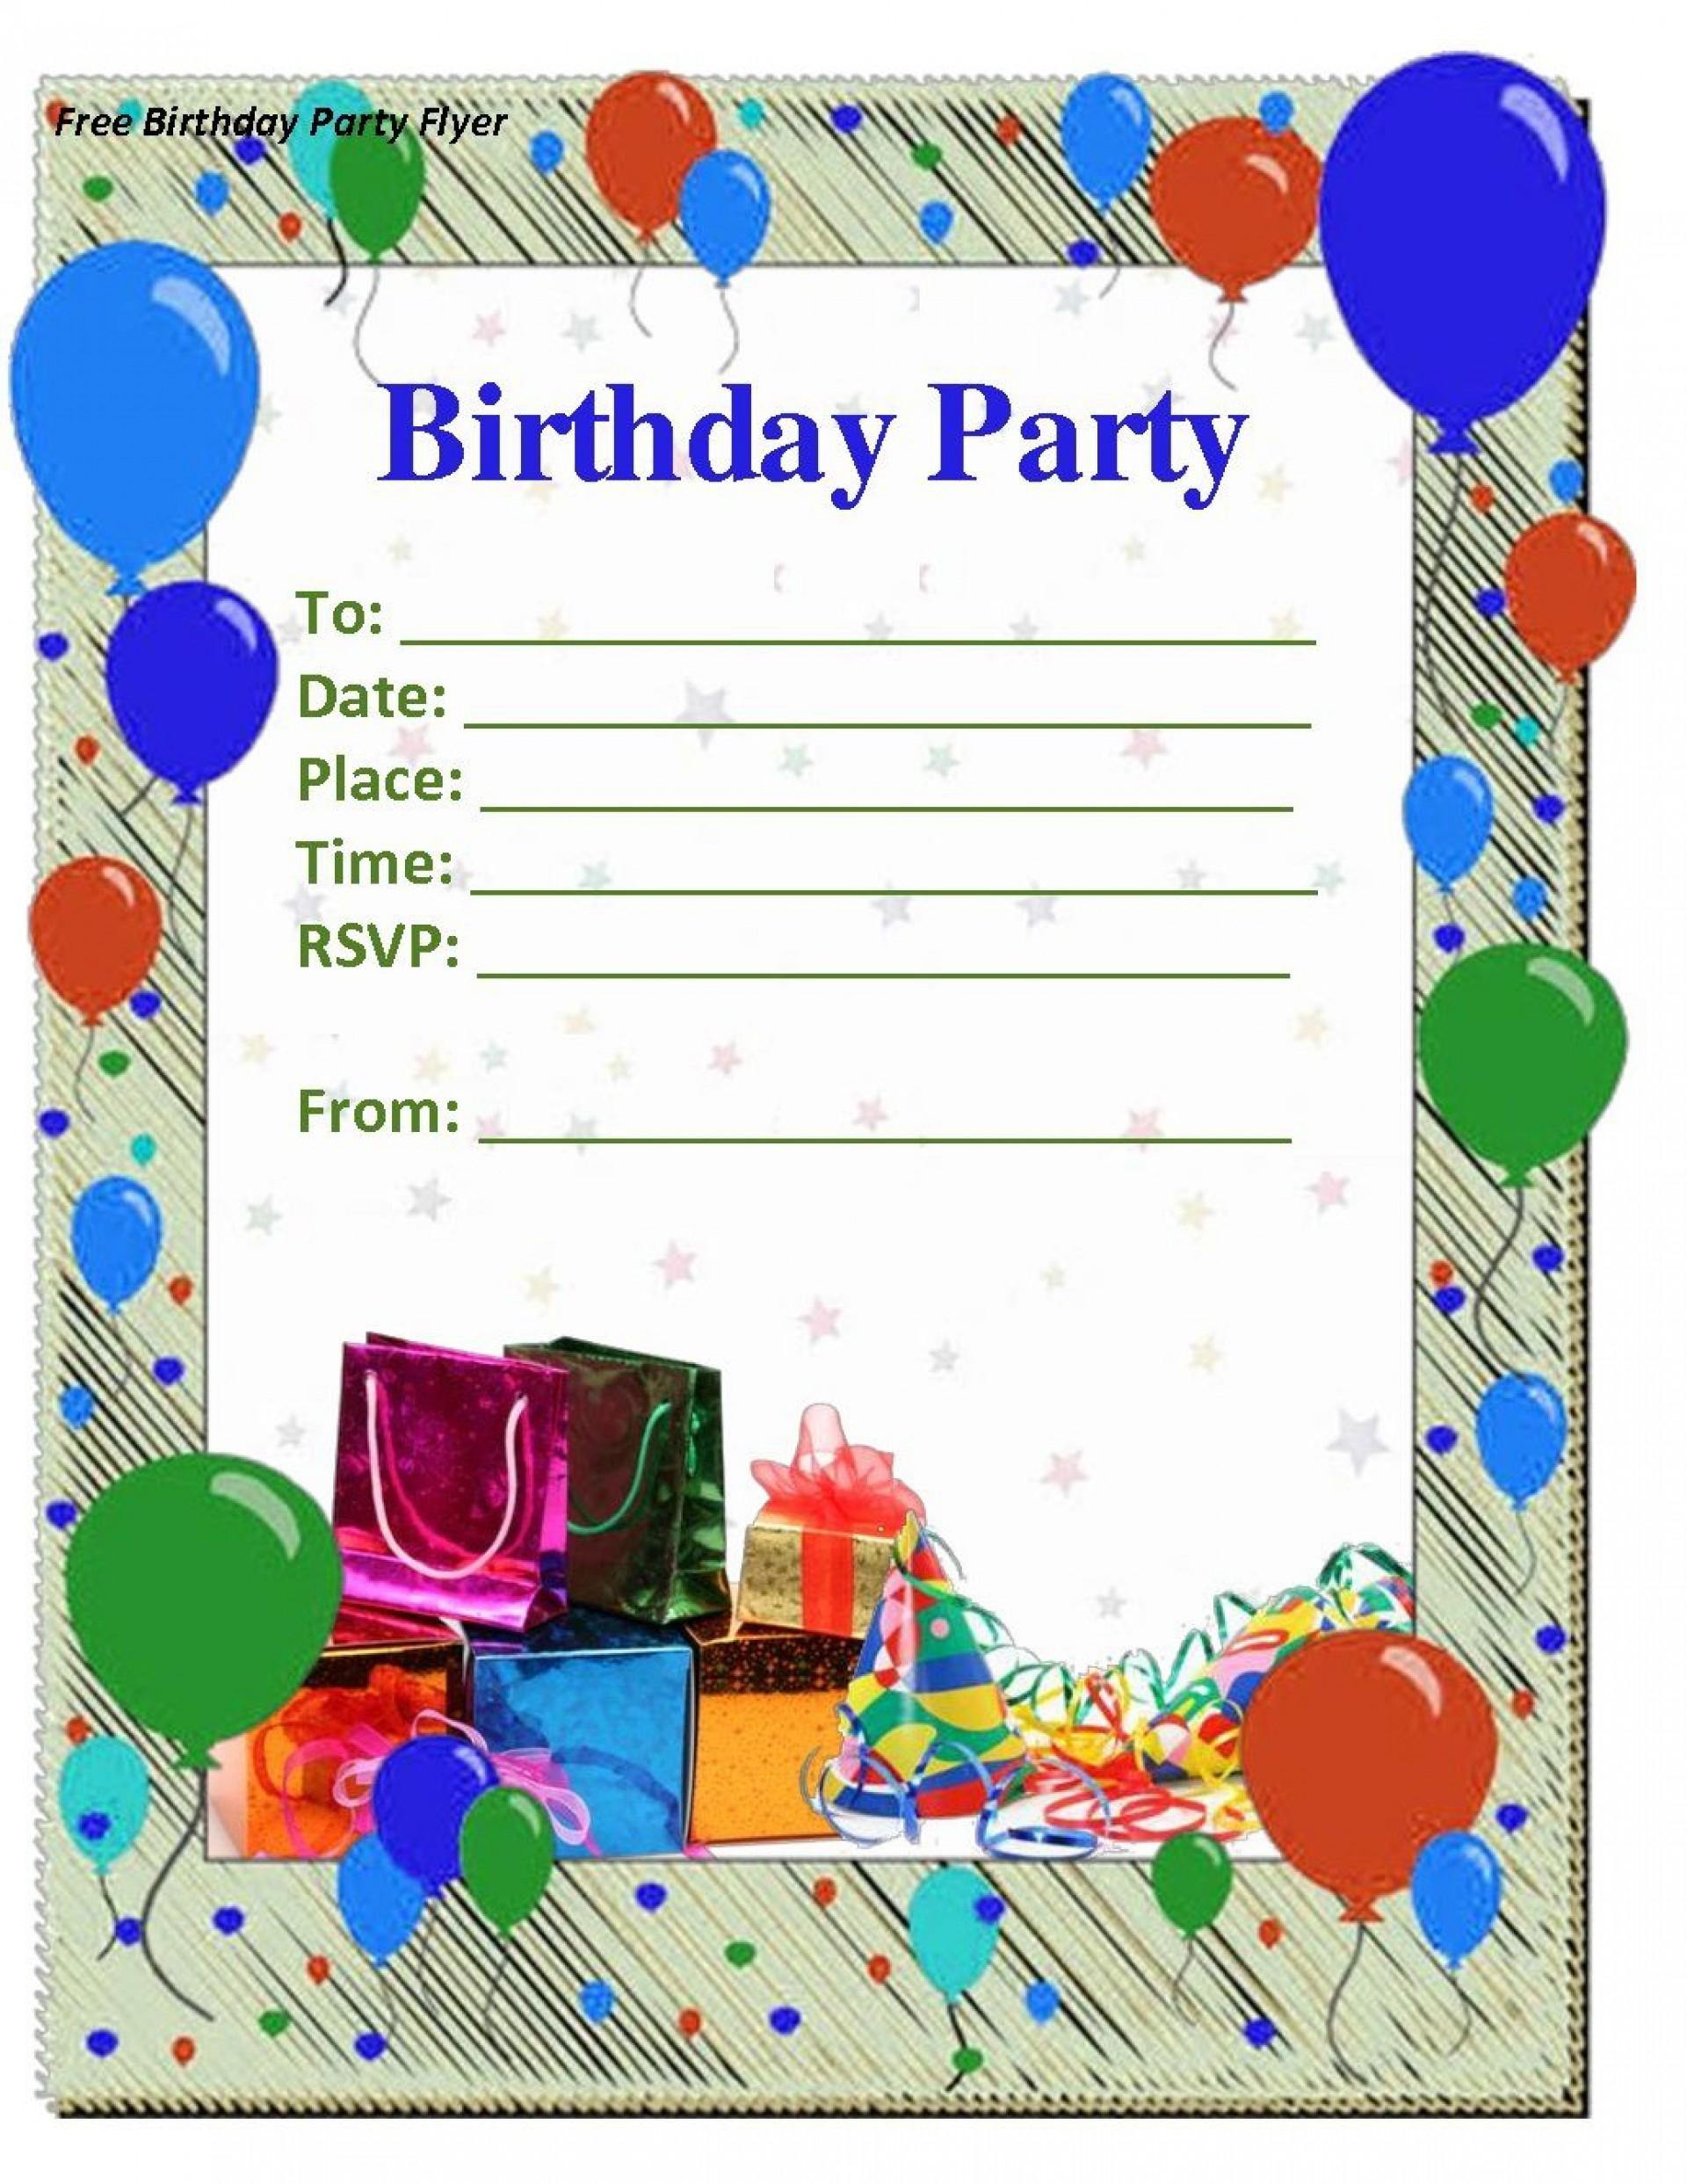 009 Impressive Birthday Party Invitation Template Word Free High Definition  Download Invite1920